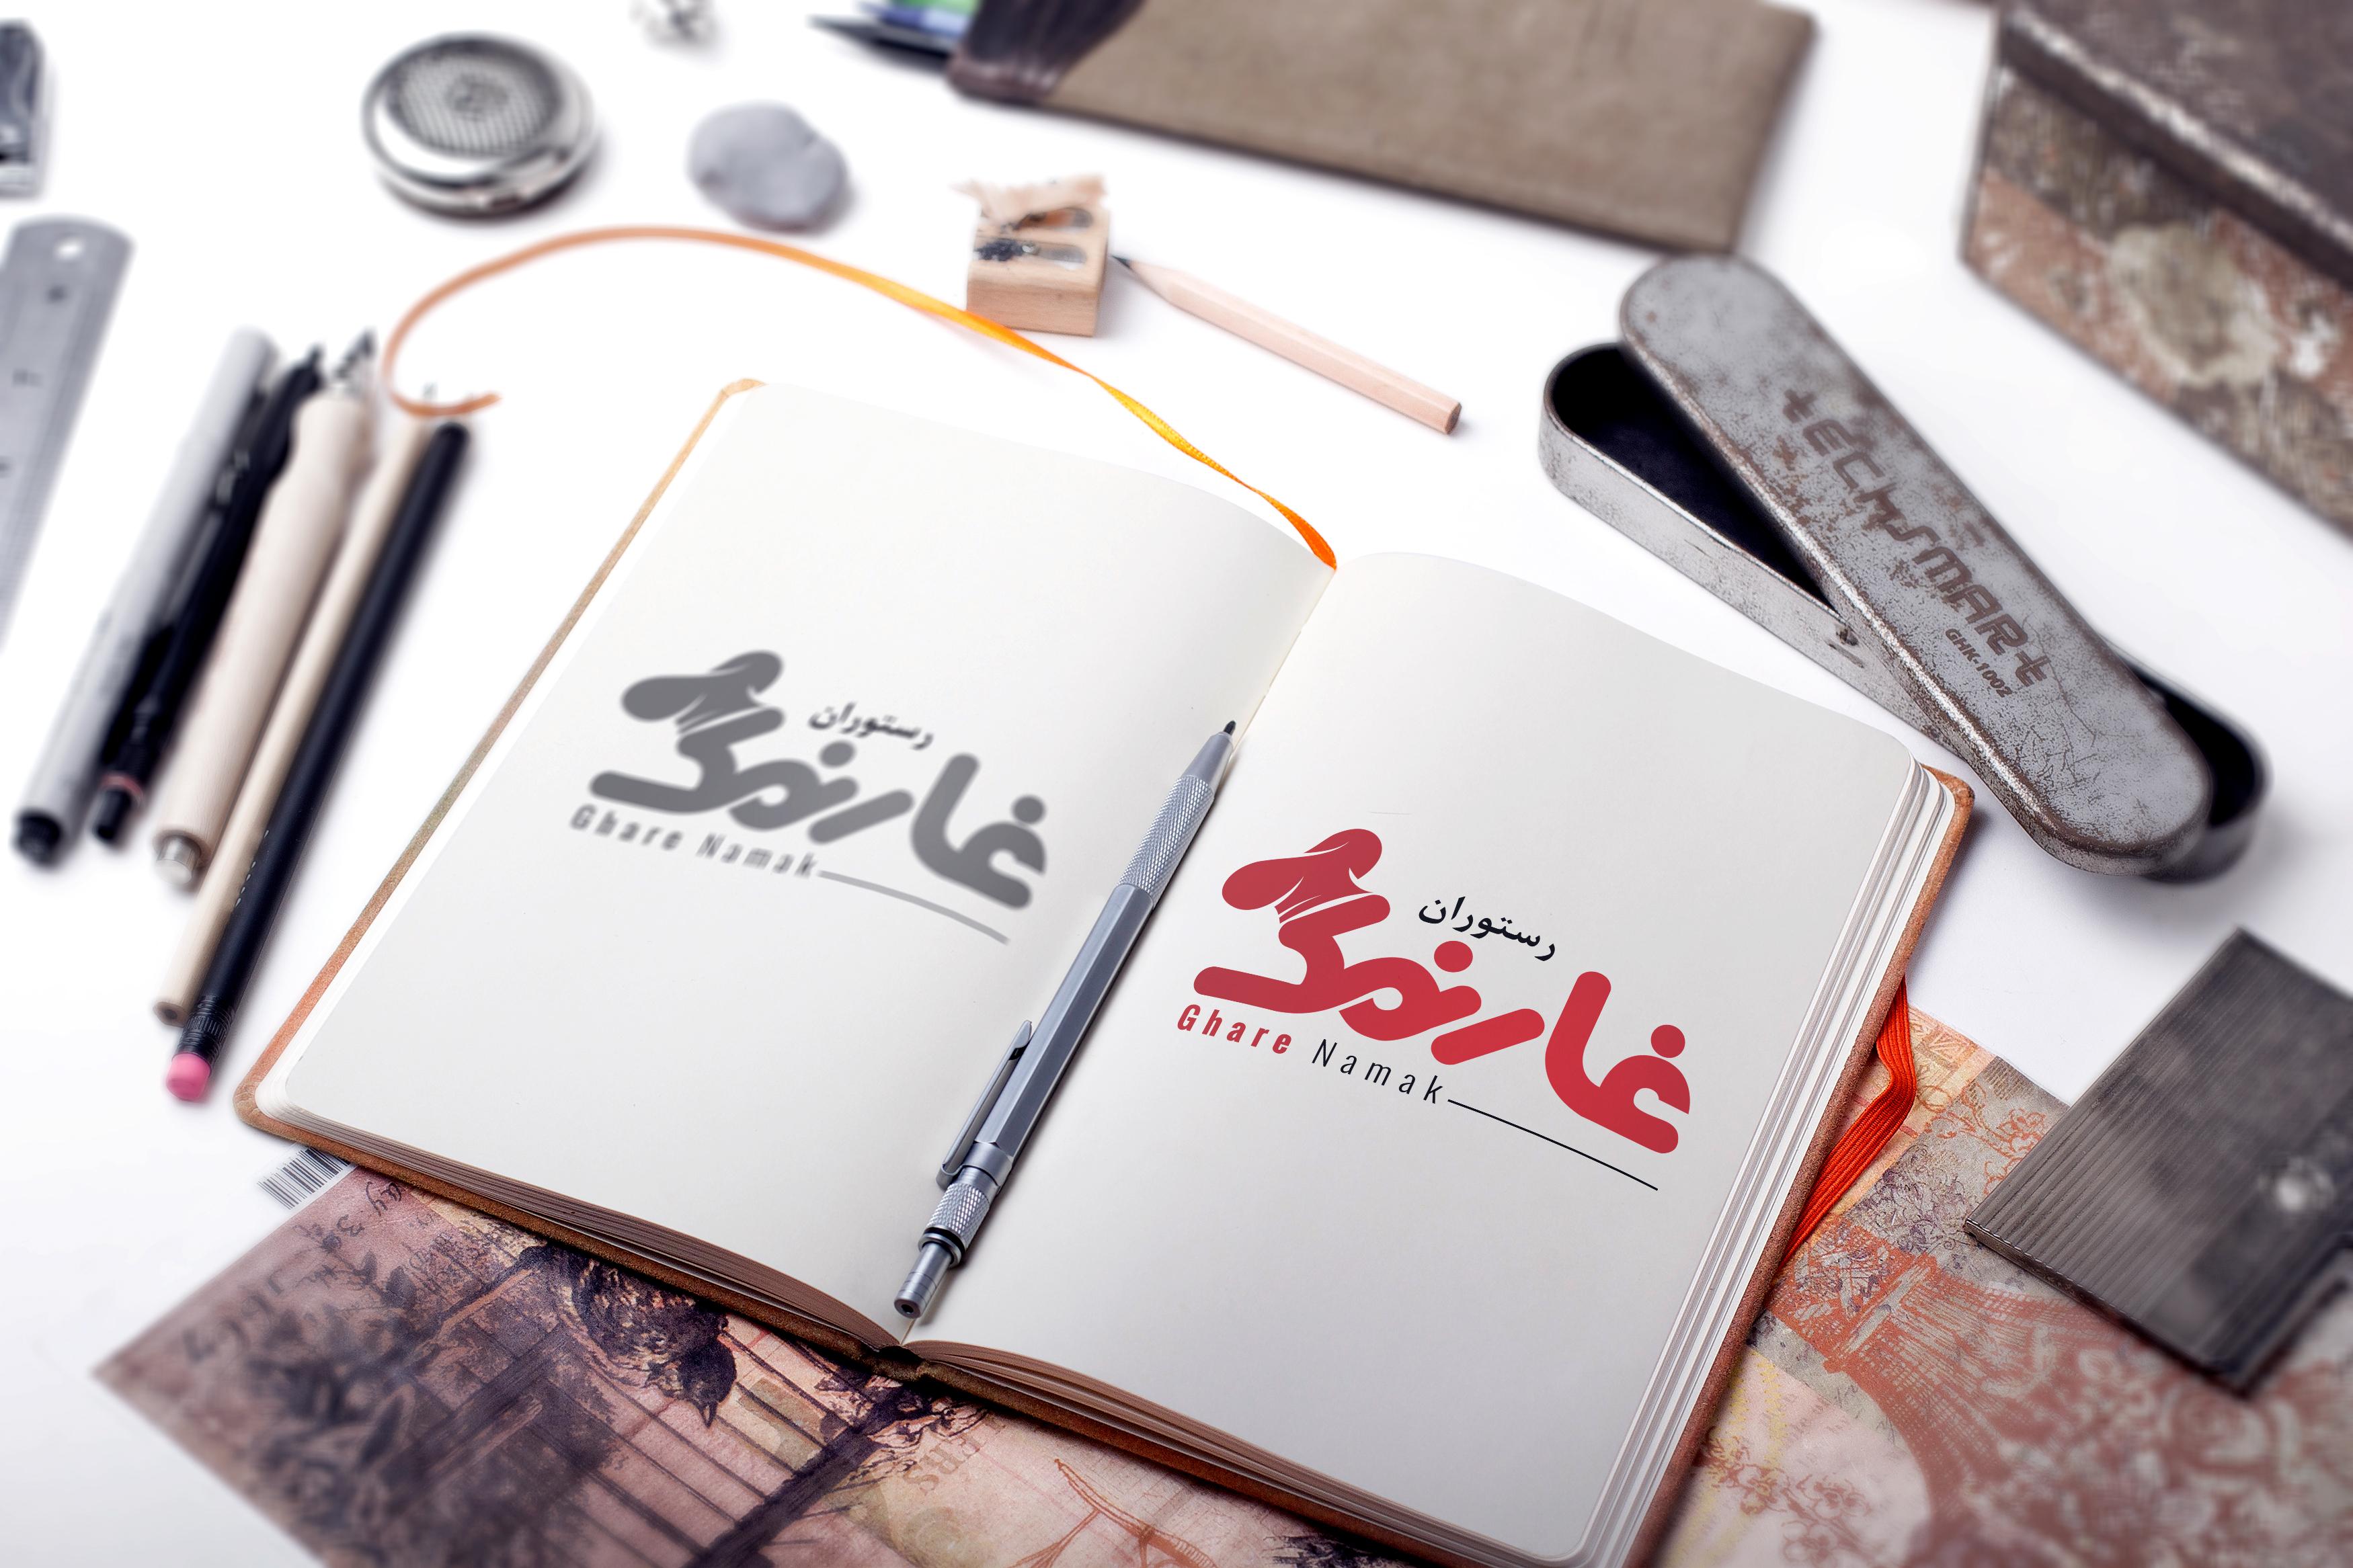 طراحی لوگو تایپ غارنمک